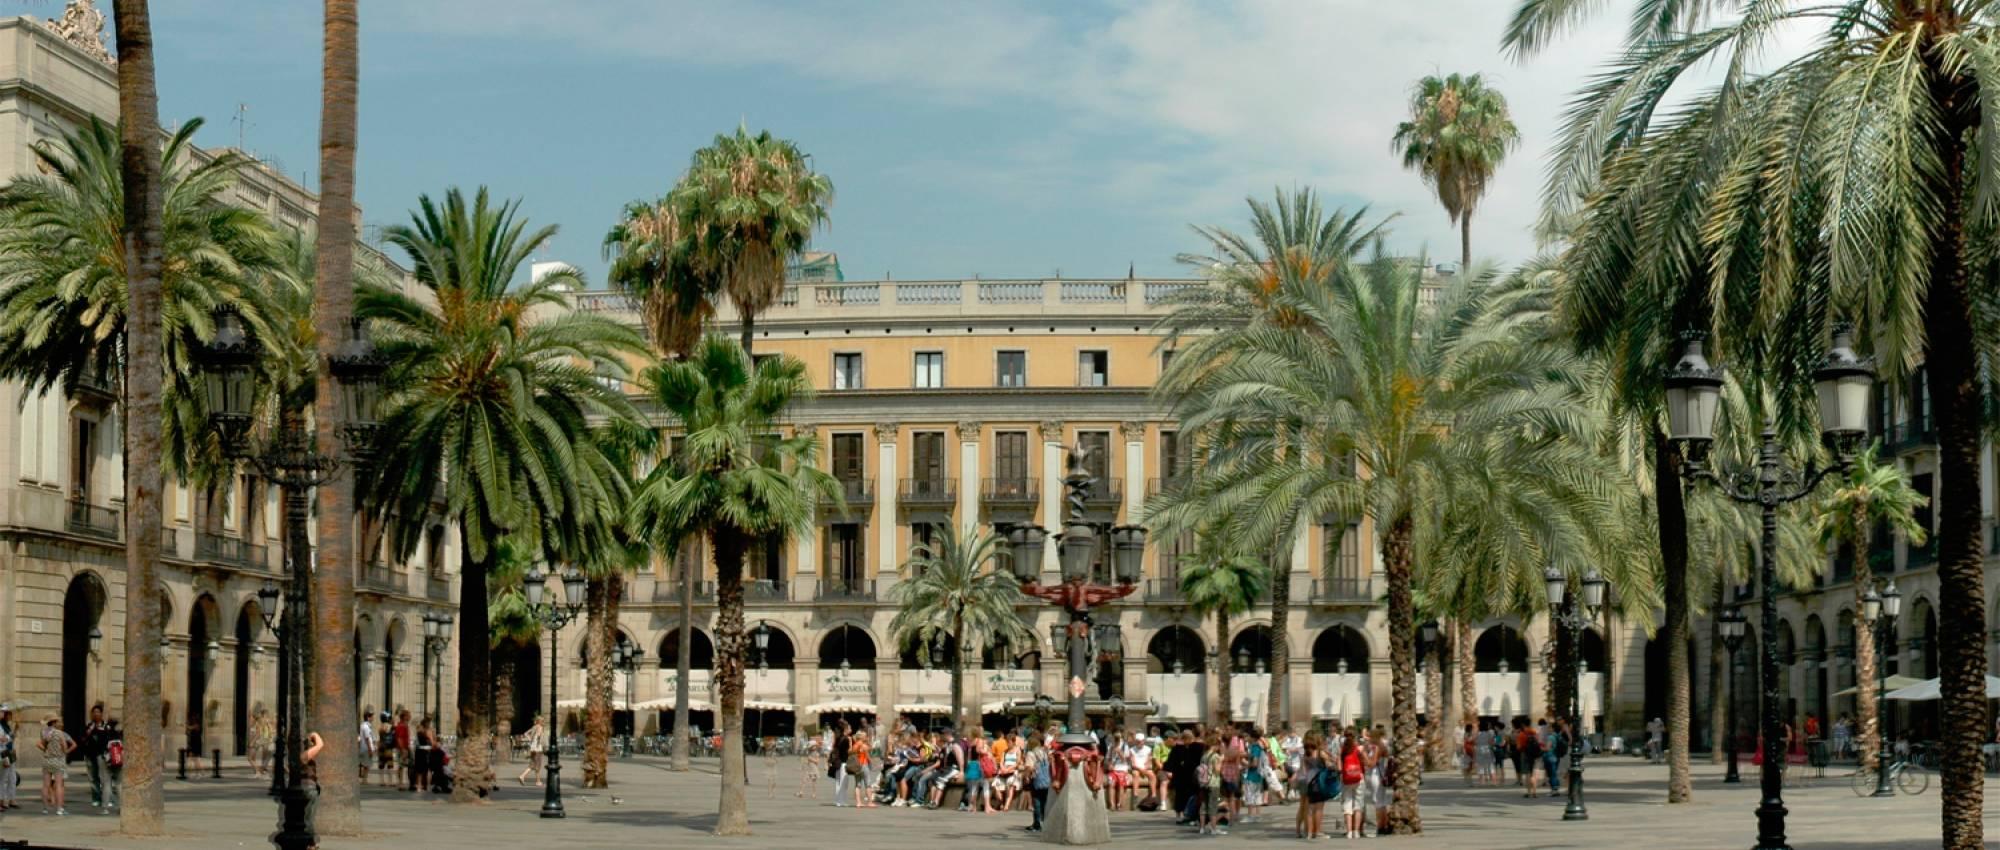 placa_reial hotel continental barcelona